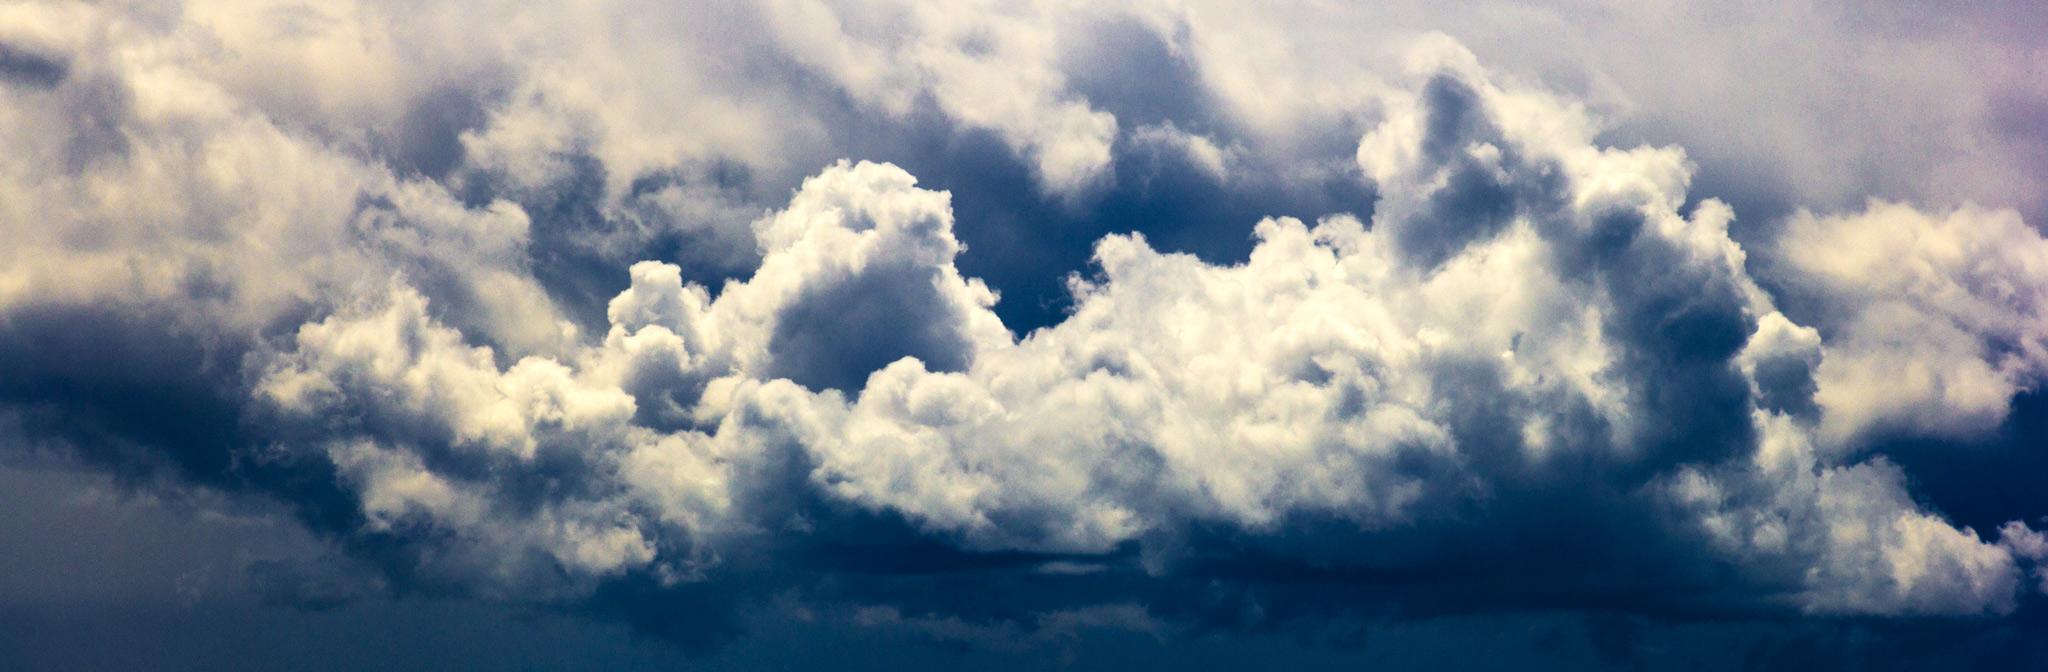 Cloud-Wall.jpg